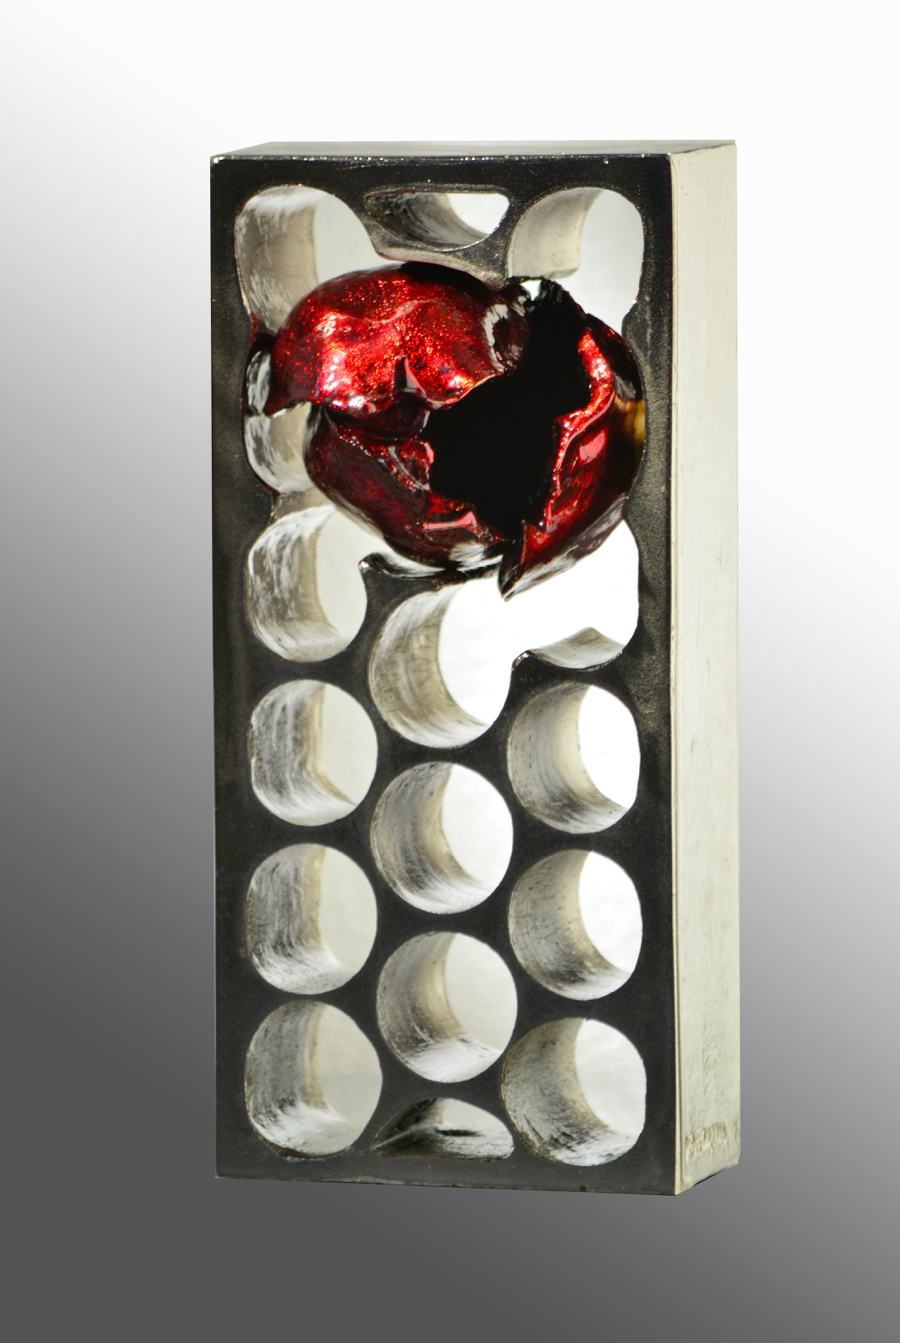 Corazón roto/Broken heart (2016) - Viviane Brickmanne